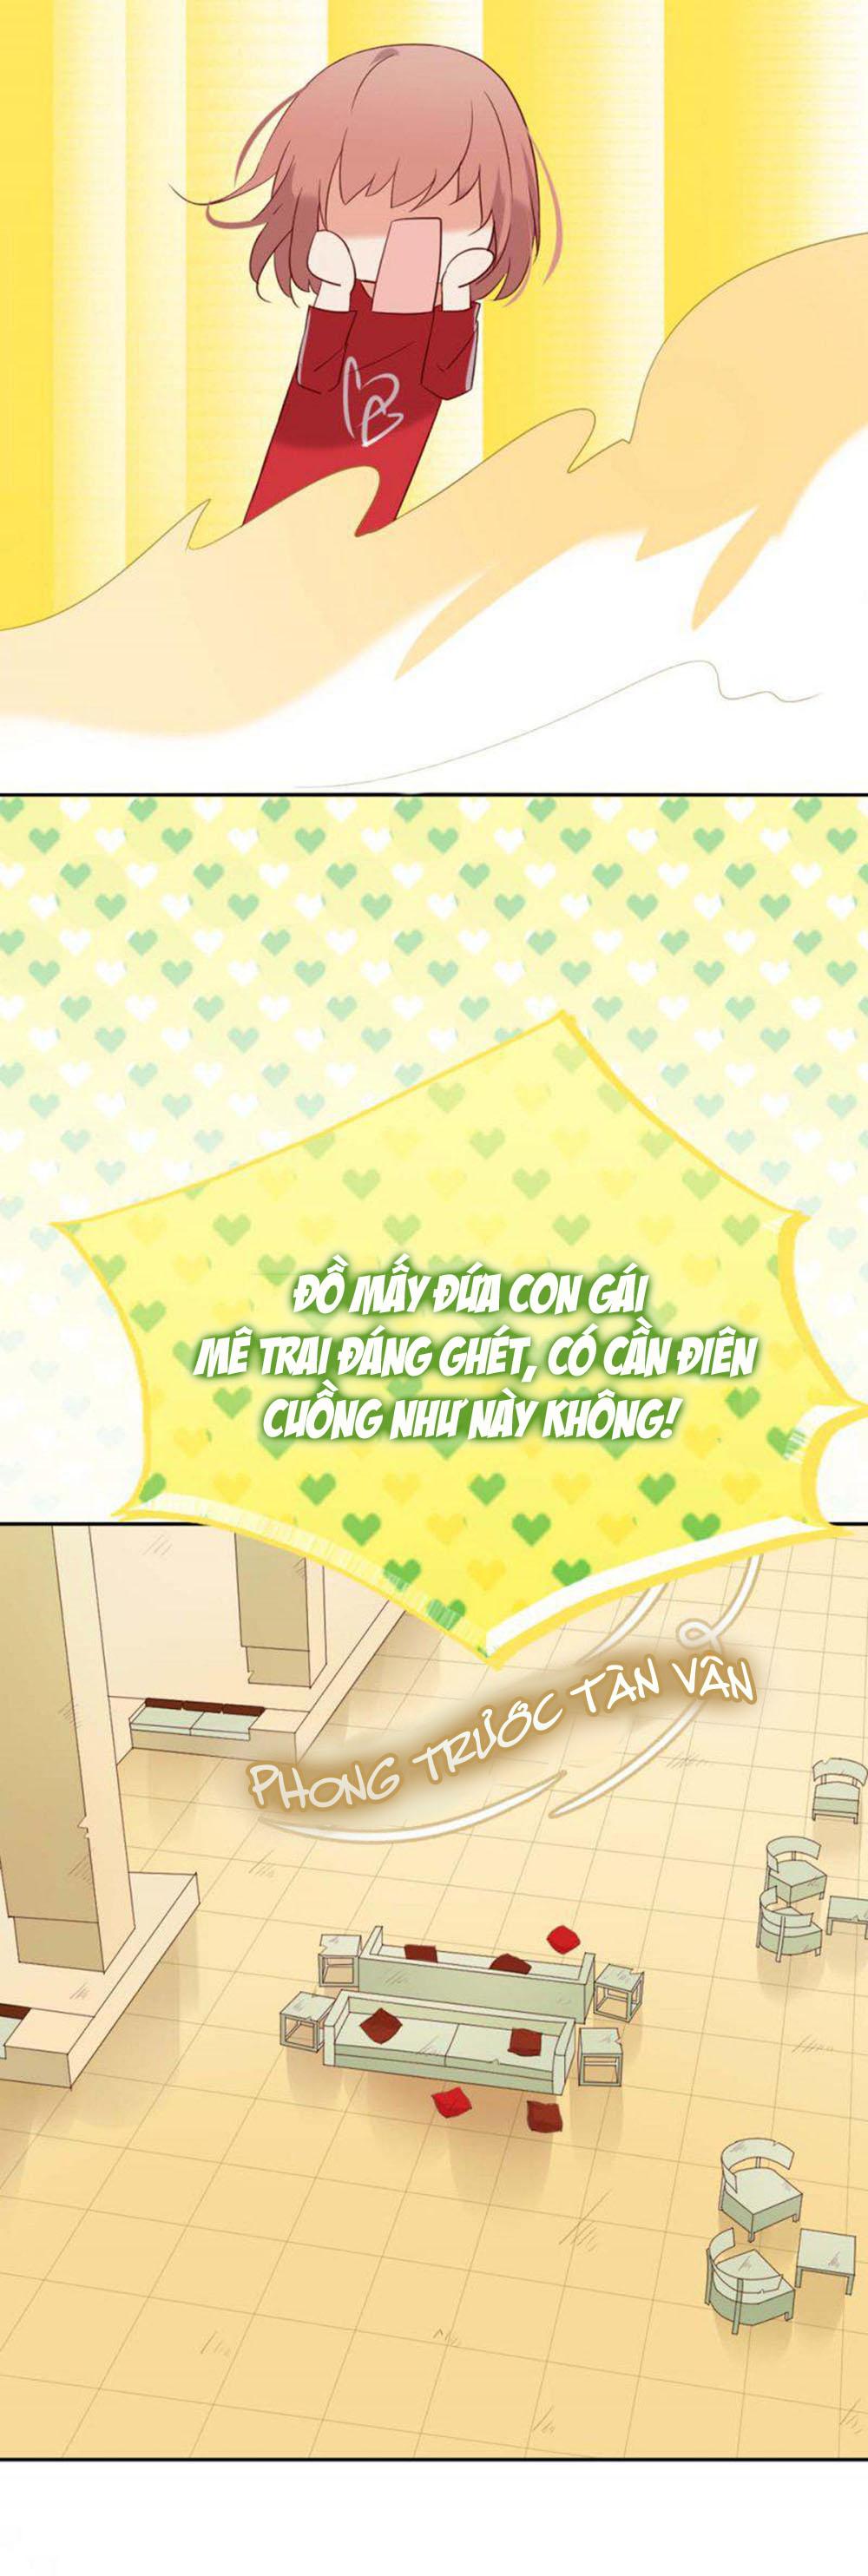 Bạn Trai Minh Tinh Bức Yêu Chap 2 - Next Chap 3